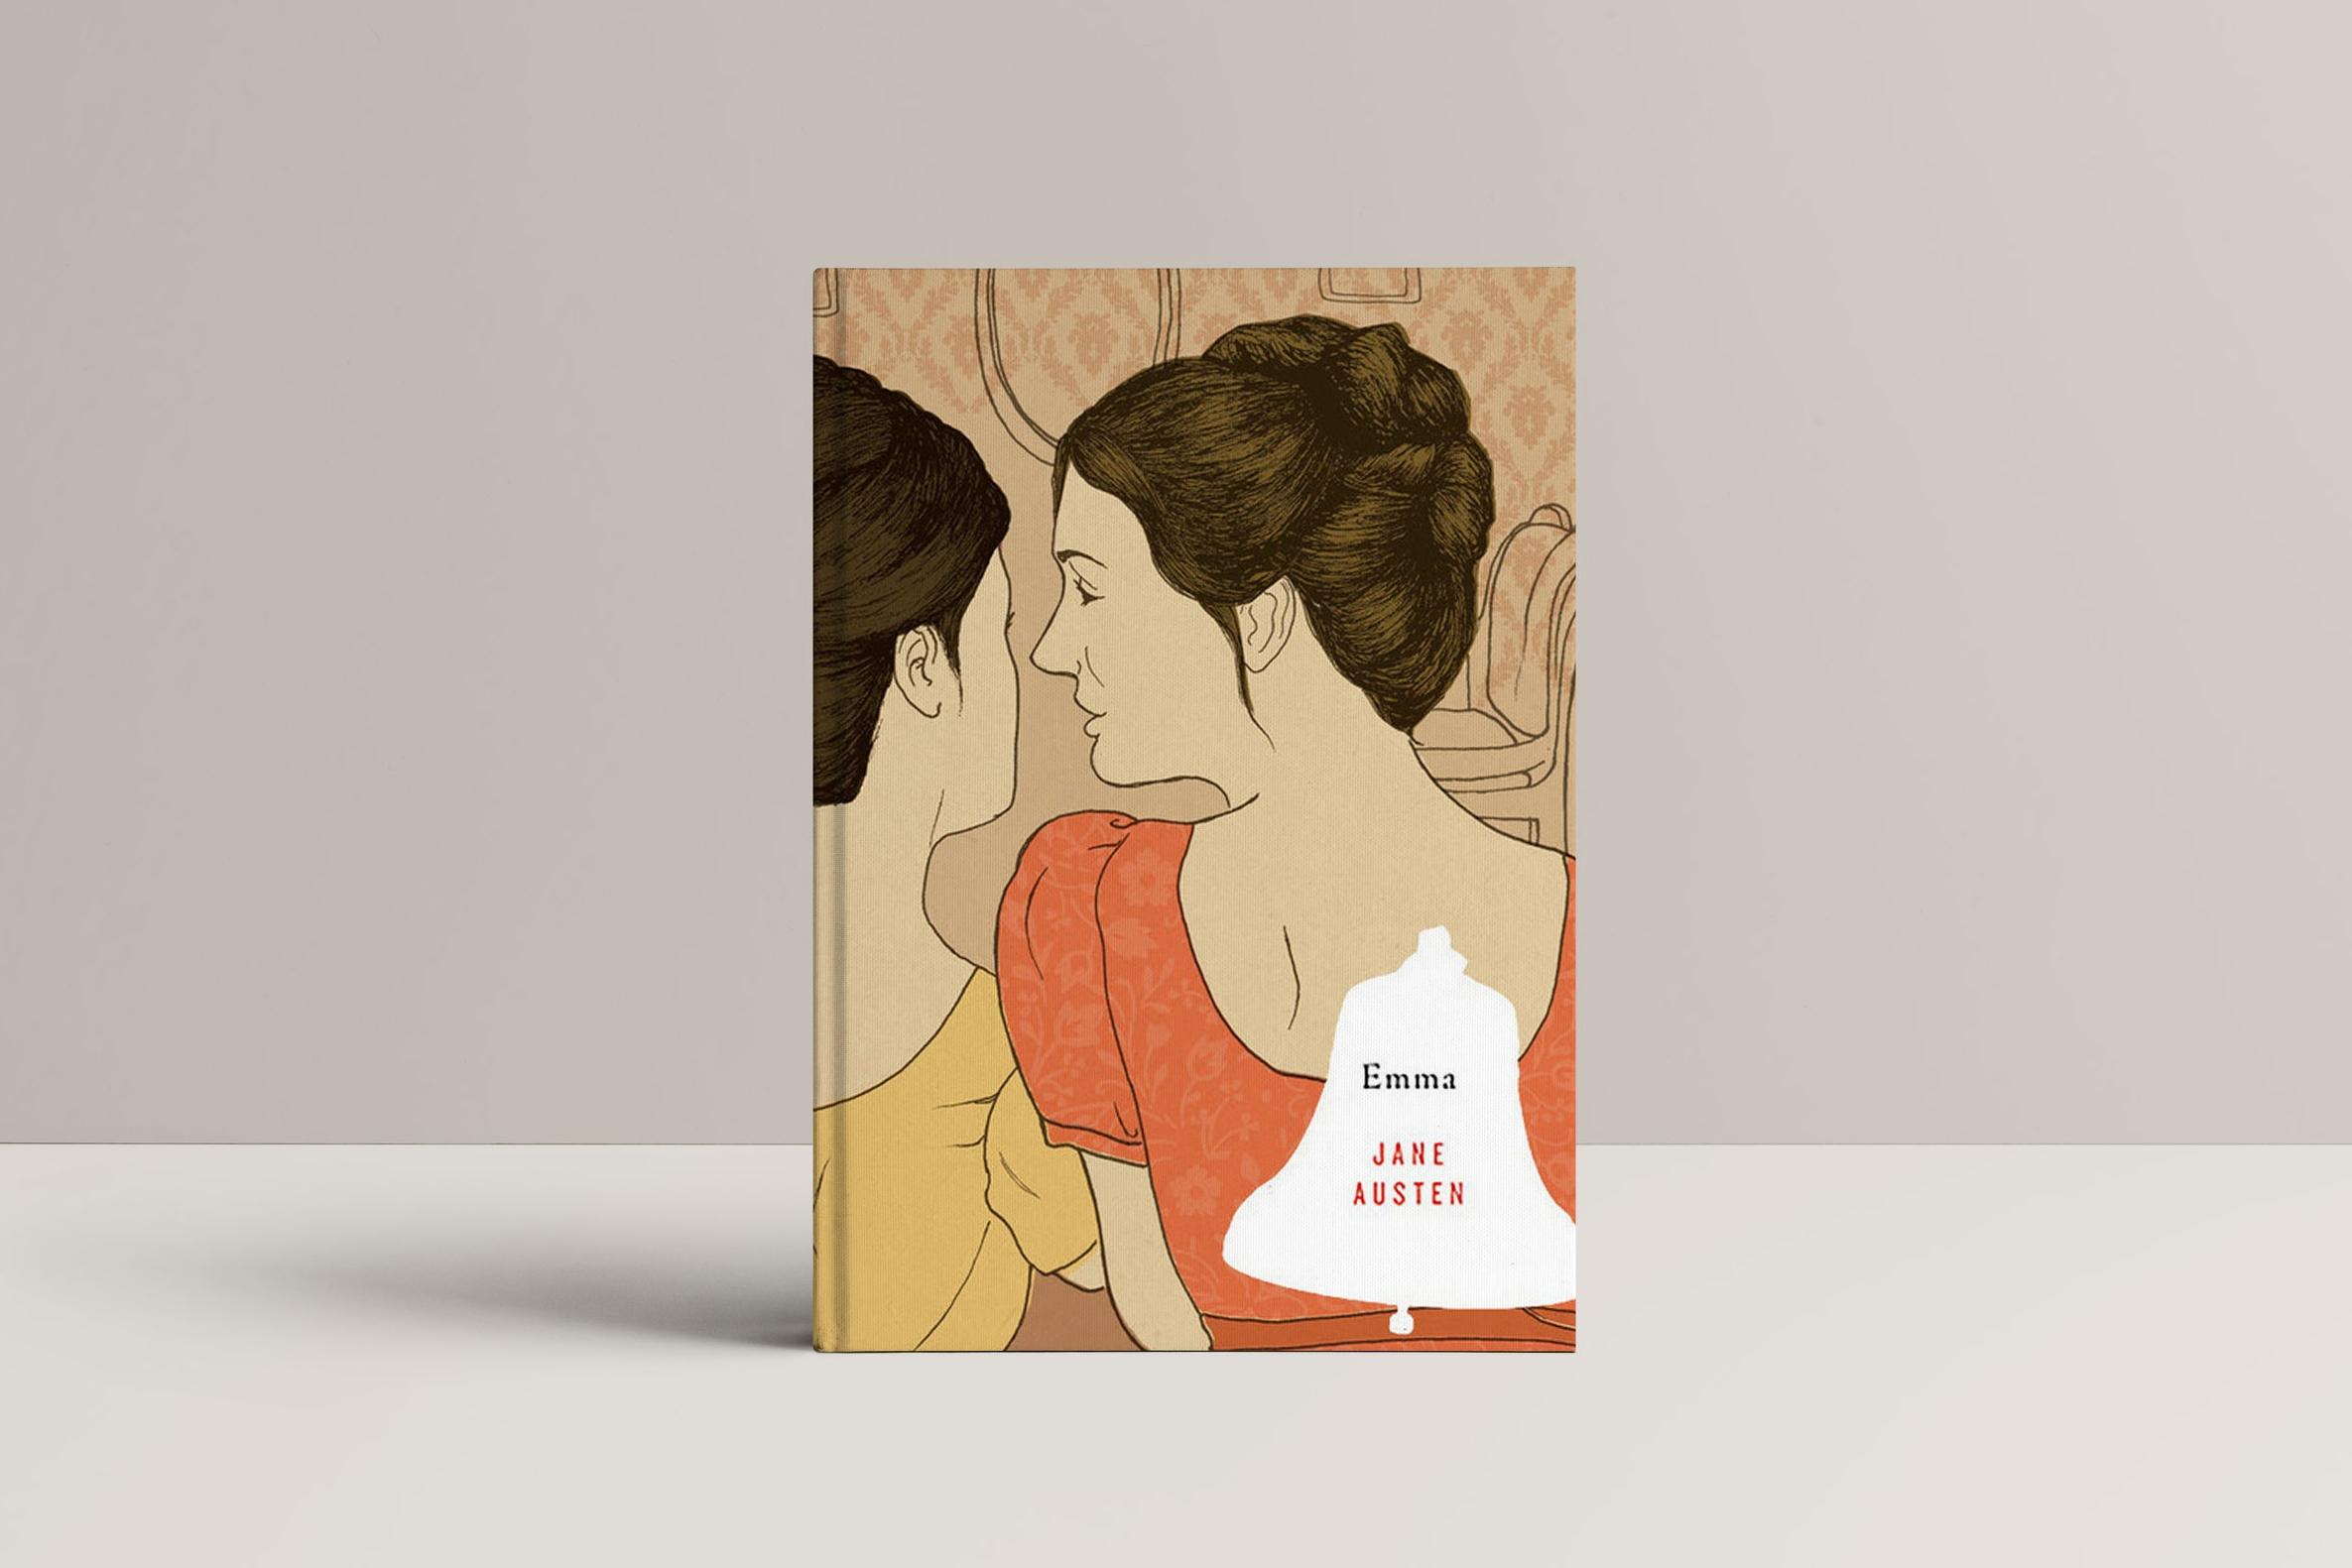 Emma, Random House Books